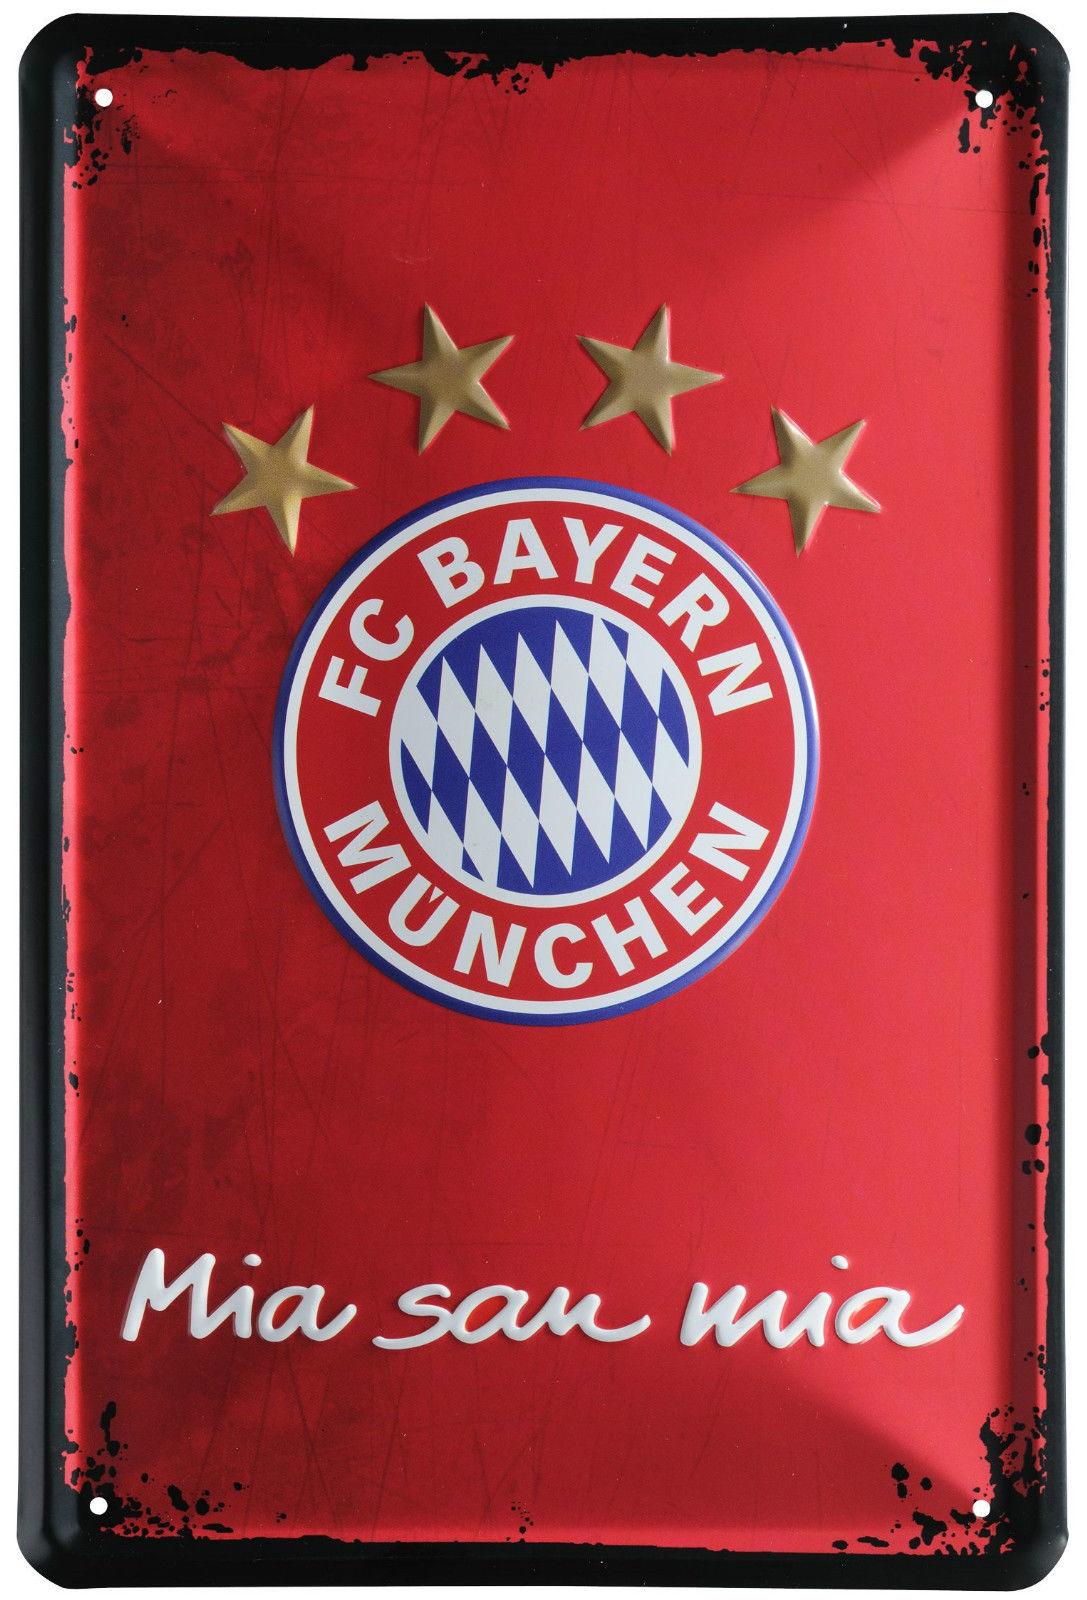 FC BAYERN MÜNCHEN Metallschild Dekoschild Wandschild Wanddeko Mia san mia 20744